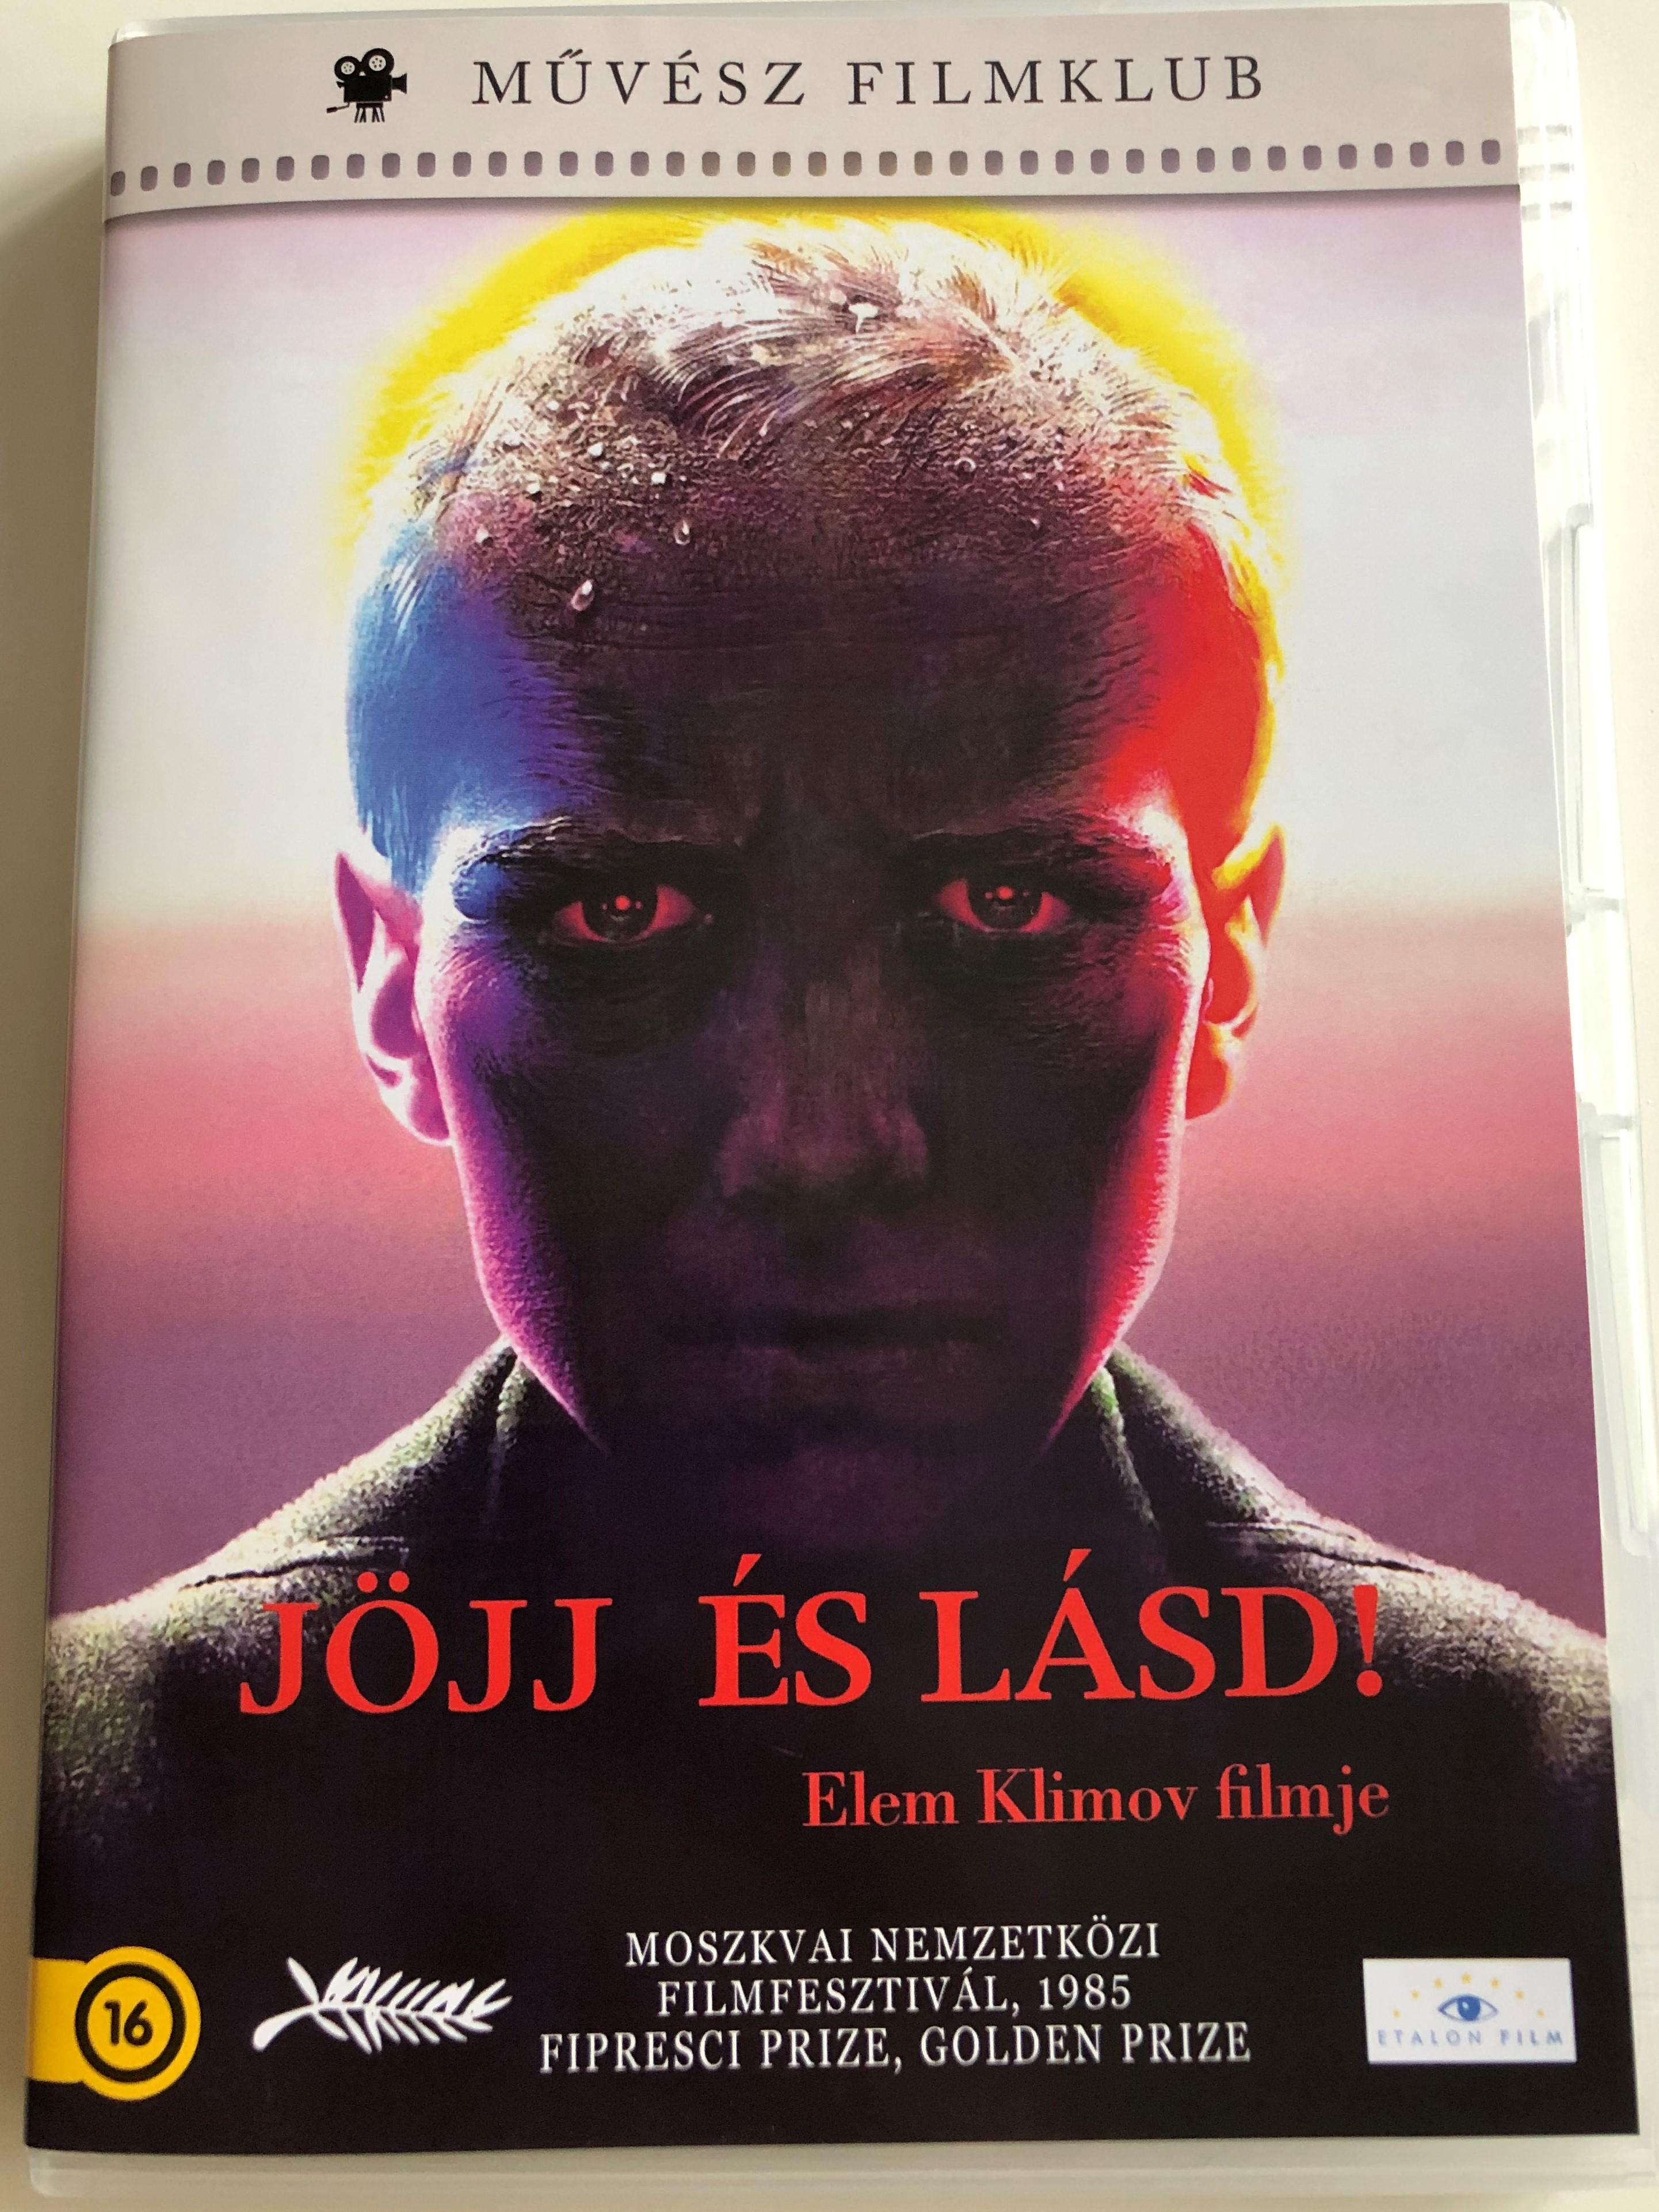 -dvd-1985-j-jj-s-l-sd-come-and-see-directed-by-elem-klimov-starring-aleksei-kravchenko-olga-mironova-1-.jpg